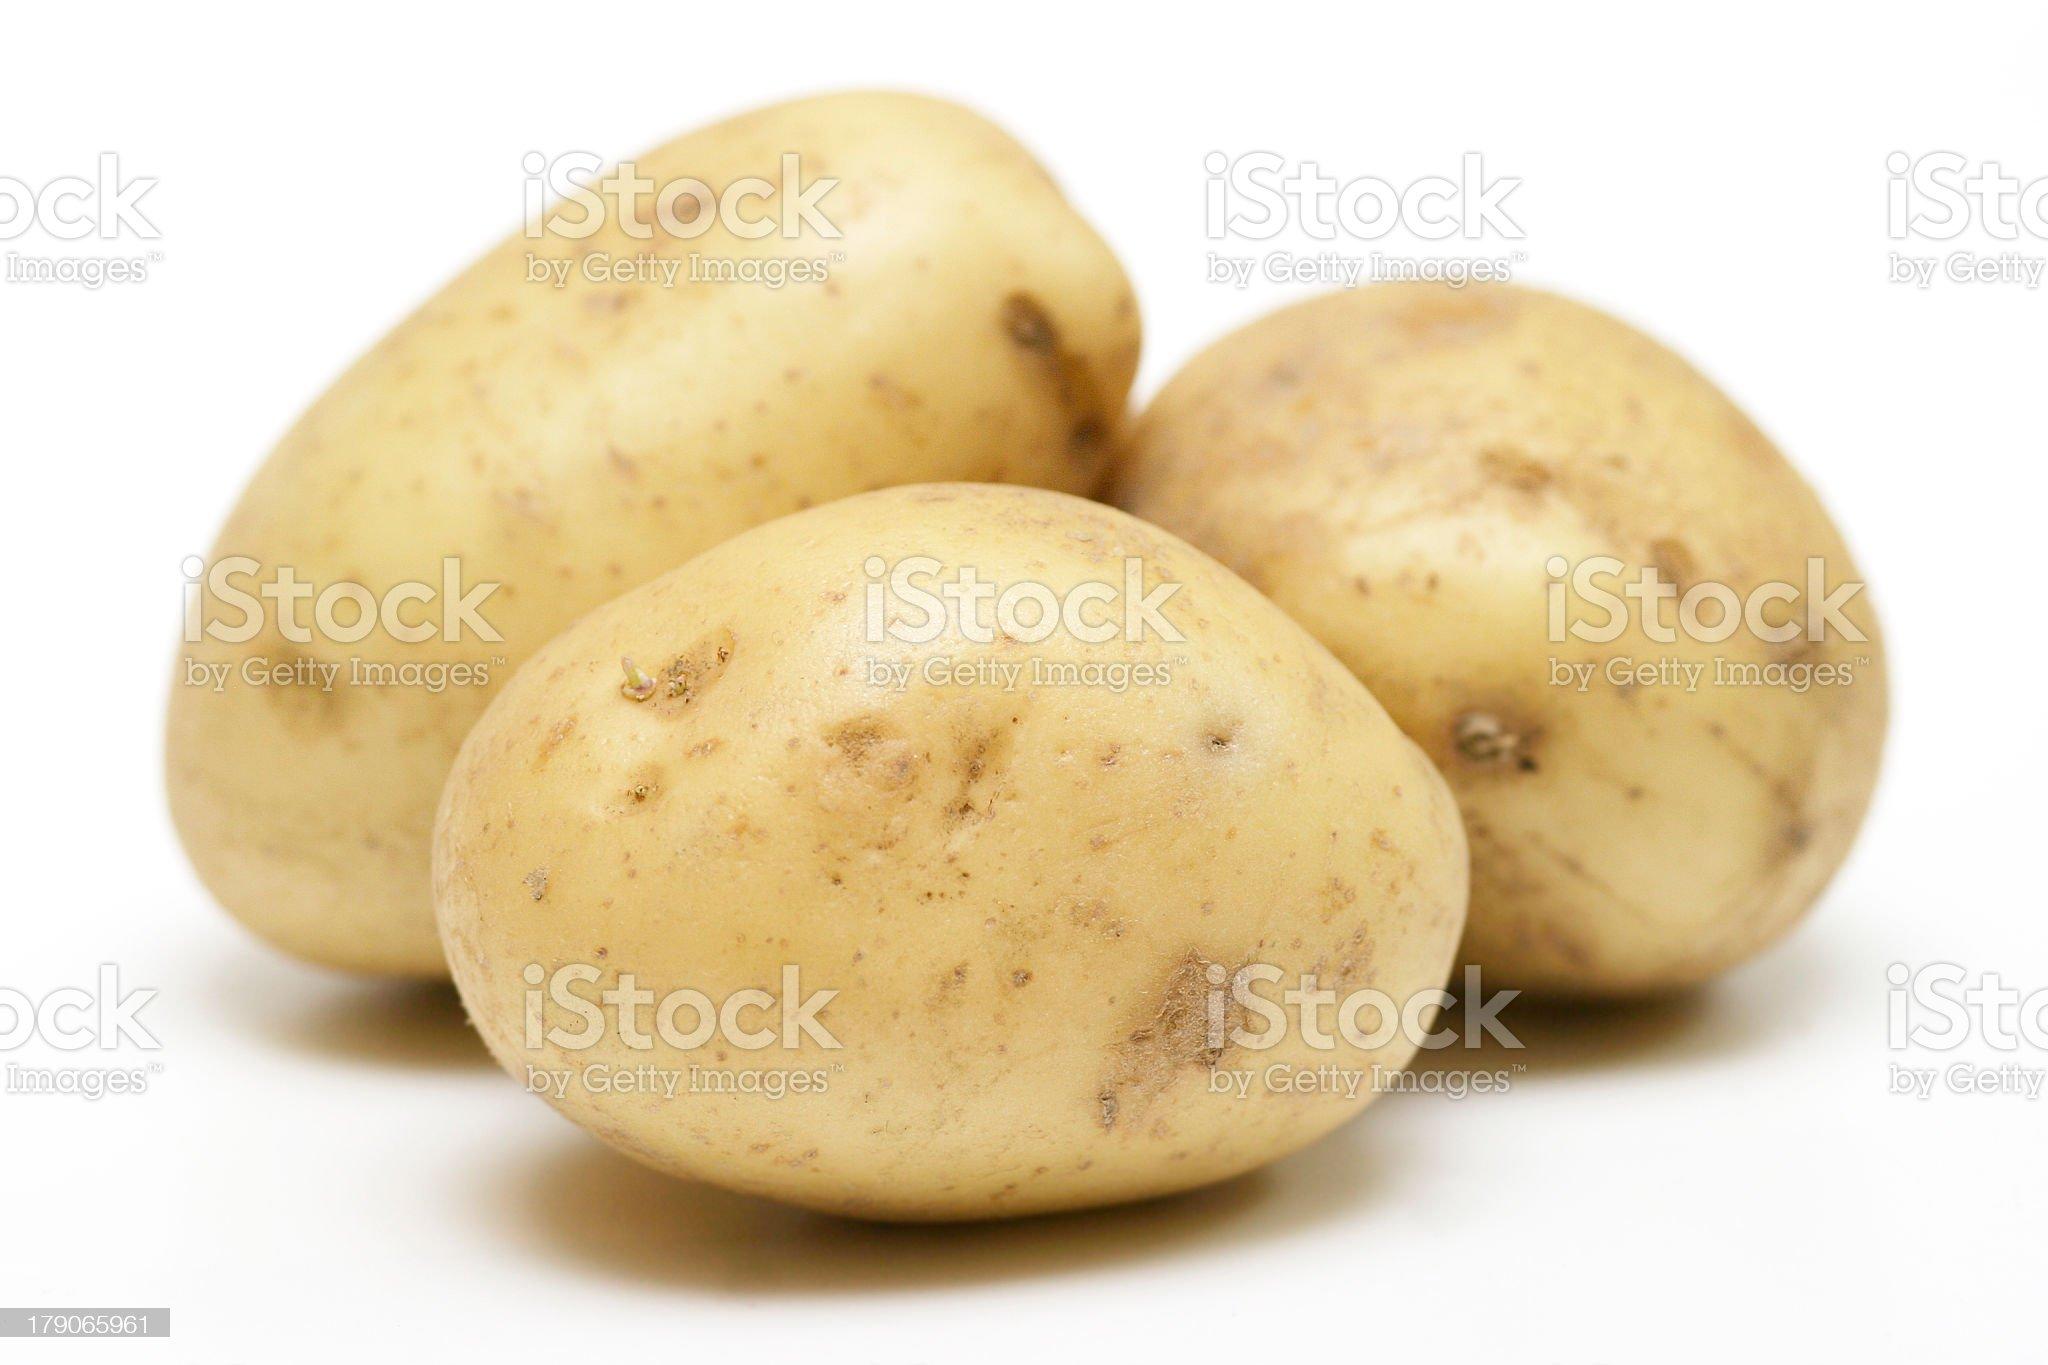 Three potatoes on a white background royalty-free stock photo